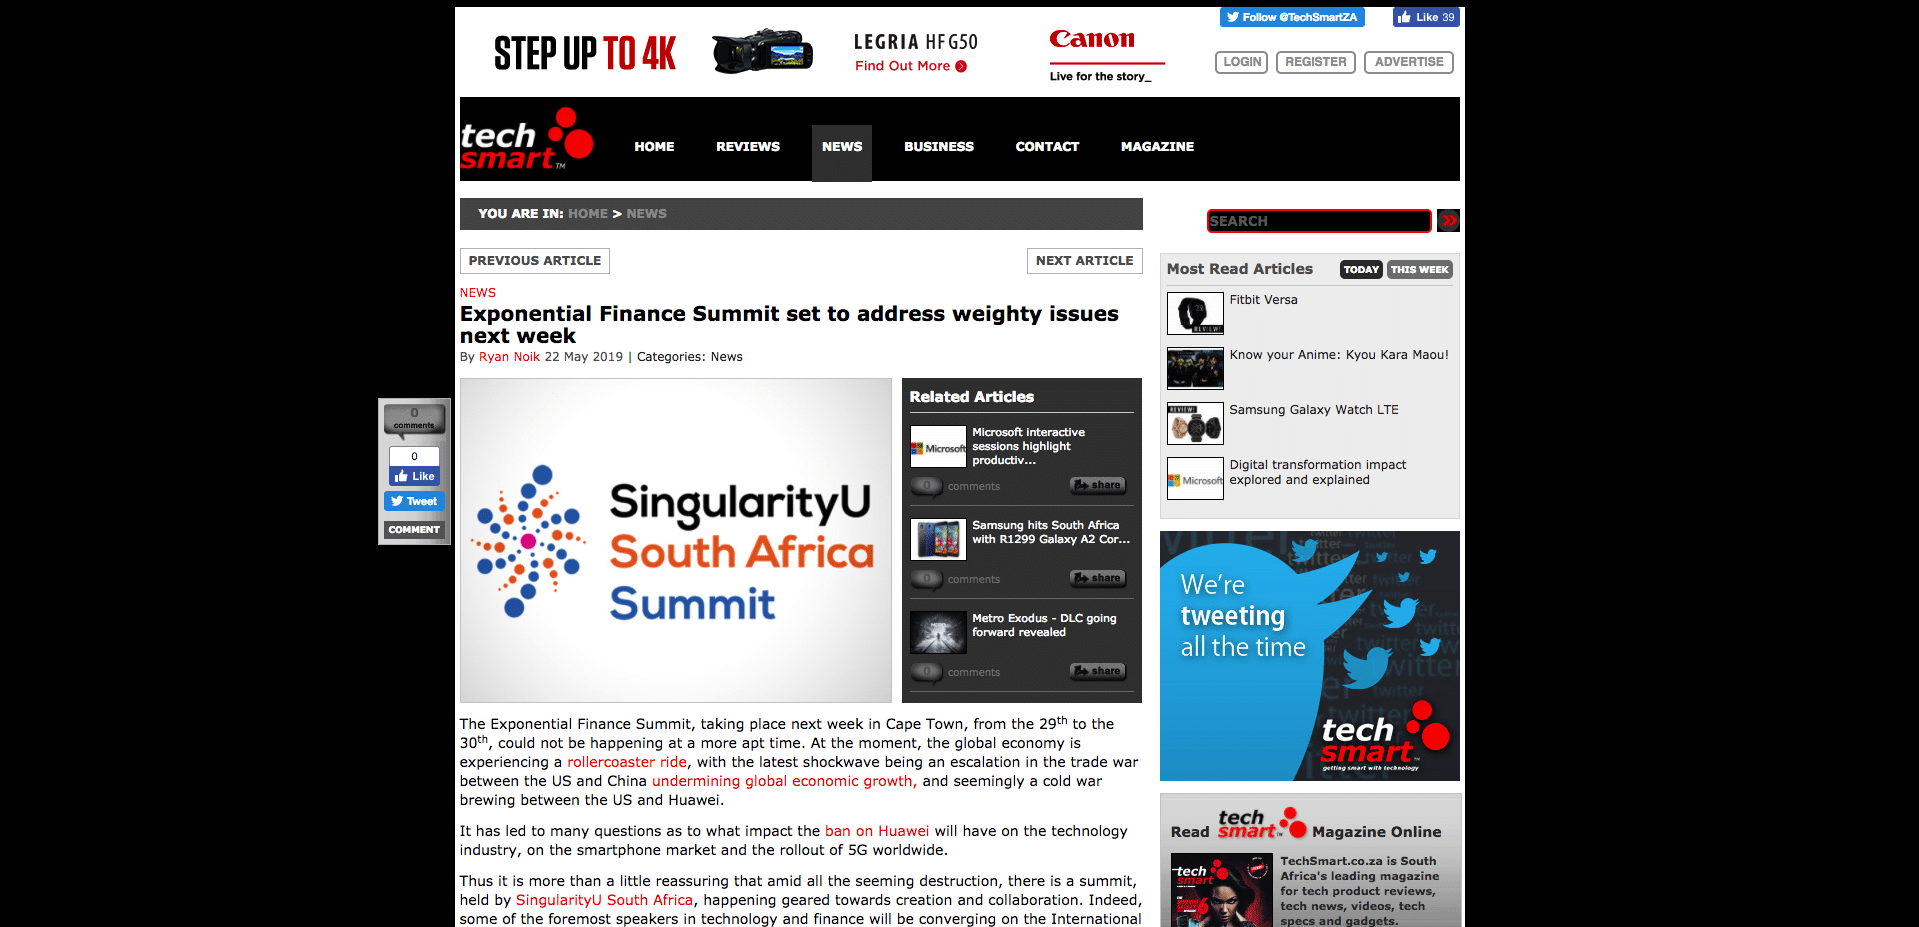 News_ Exponential Finance Summit set _ - http___www.techsmart.co.za_news_Ex